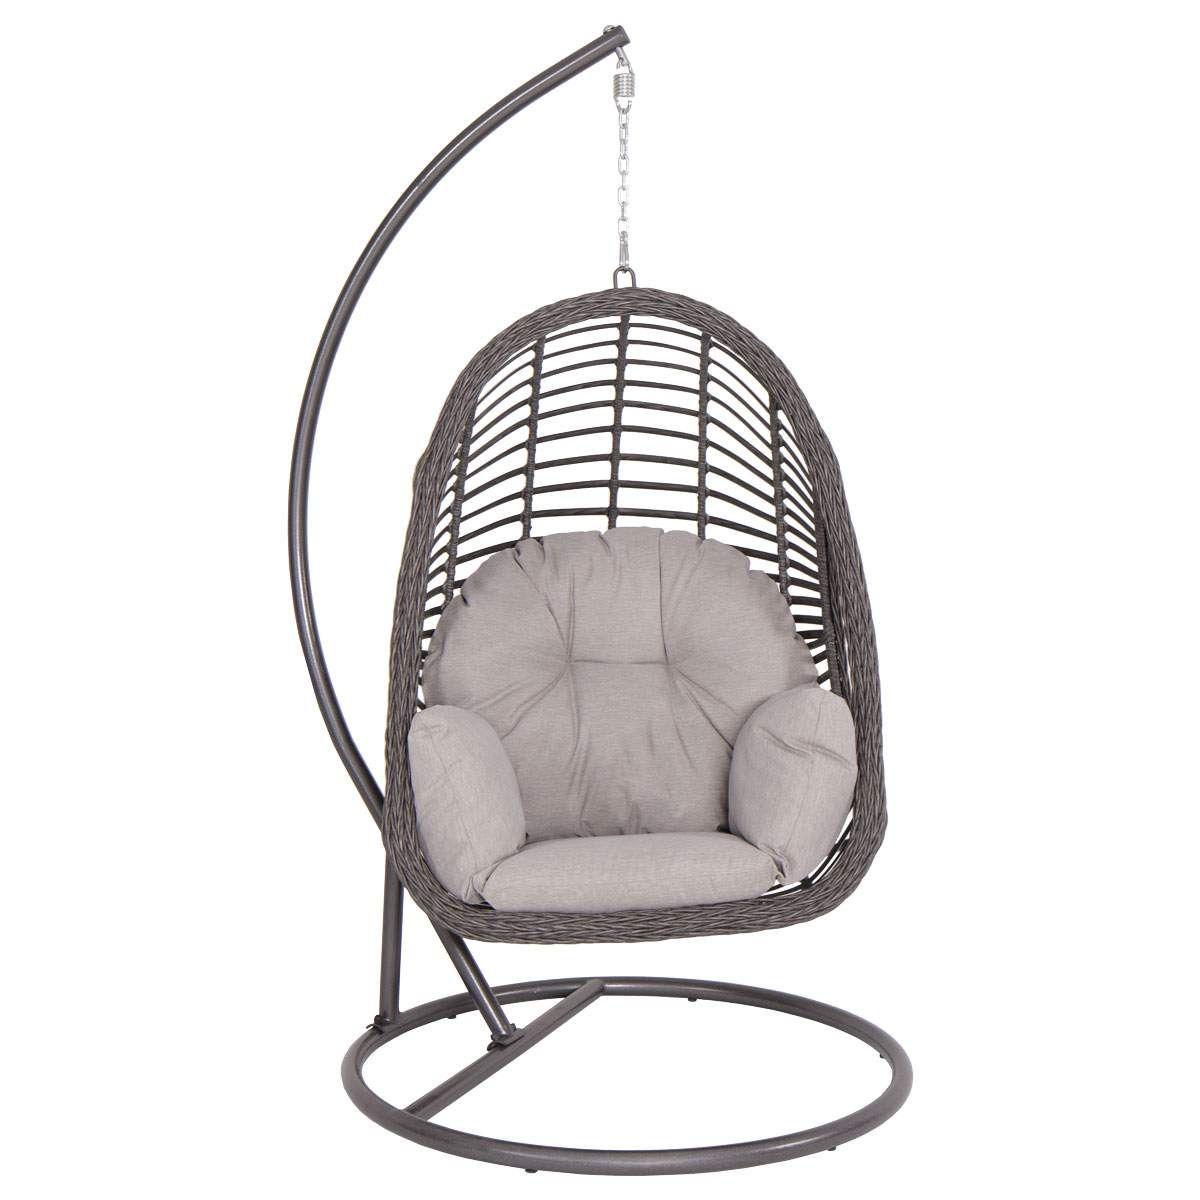 Hanging basket chair aluminum wicker patio furniture